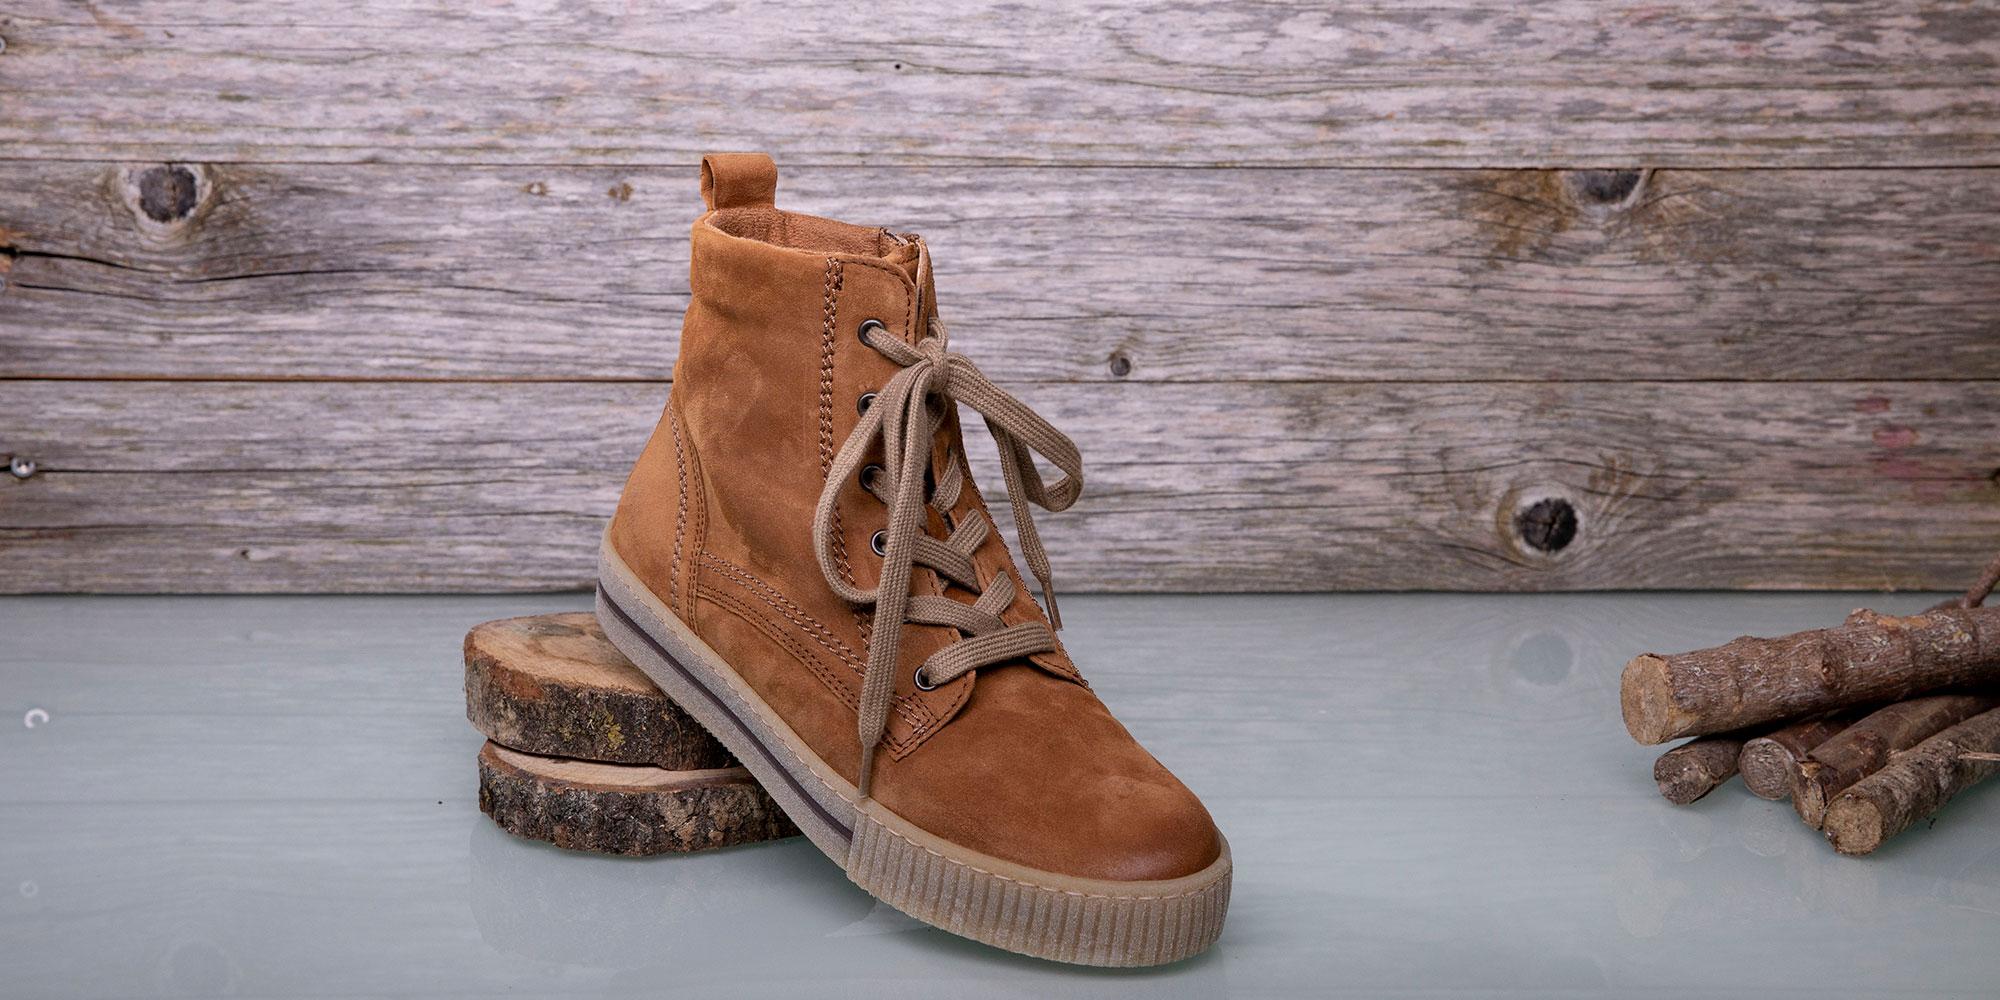 Schuh1